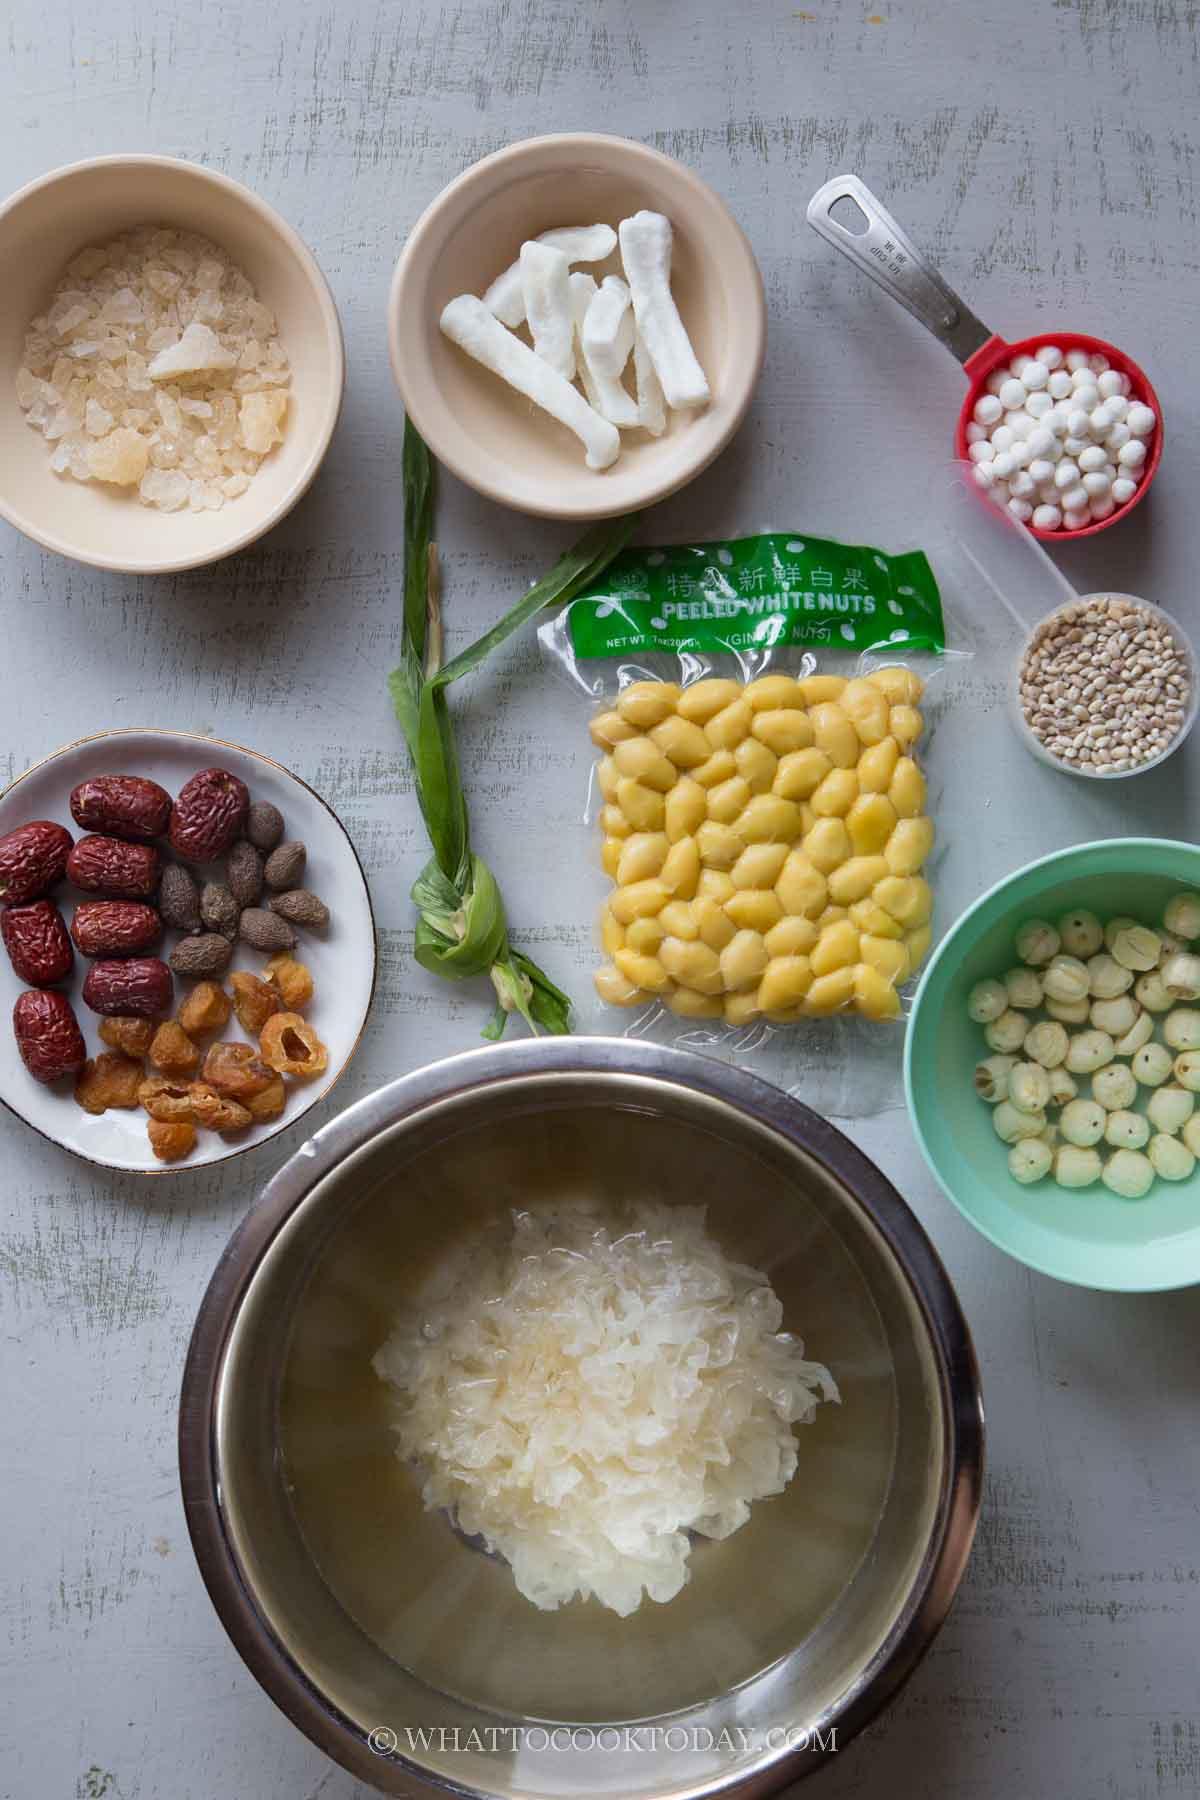 How To Make Pang Da Hai Cheng Tng (清汤)